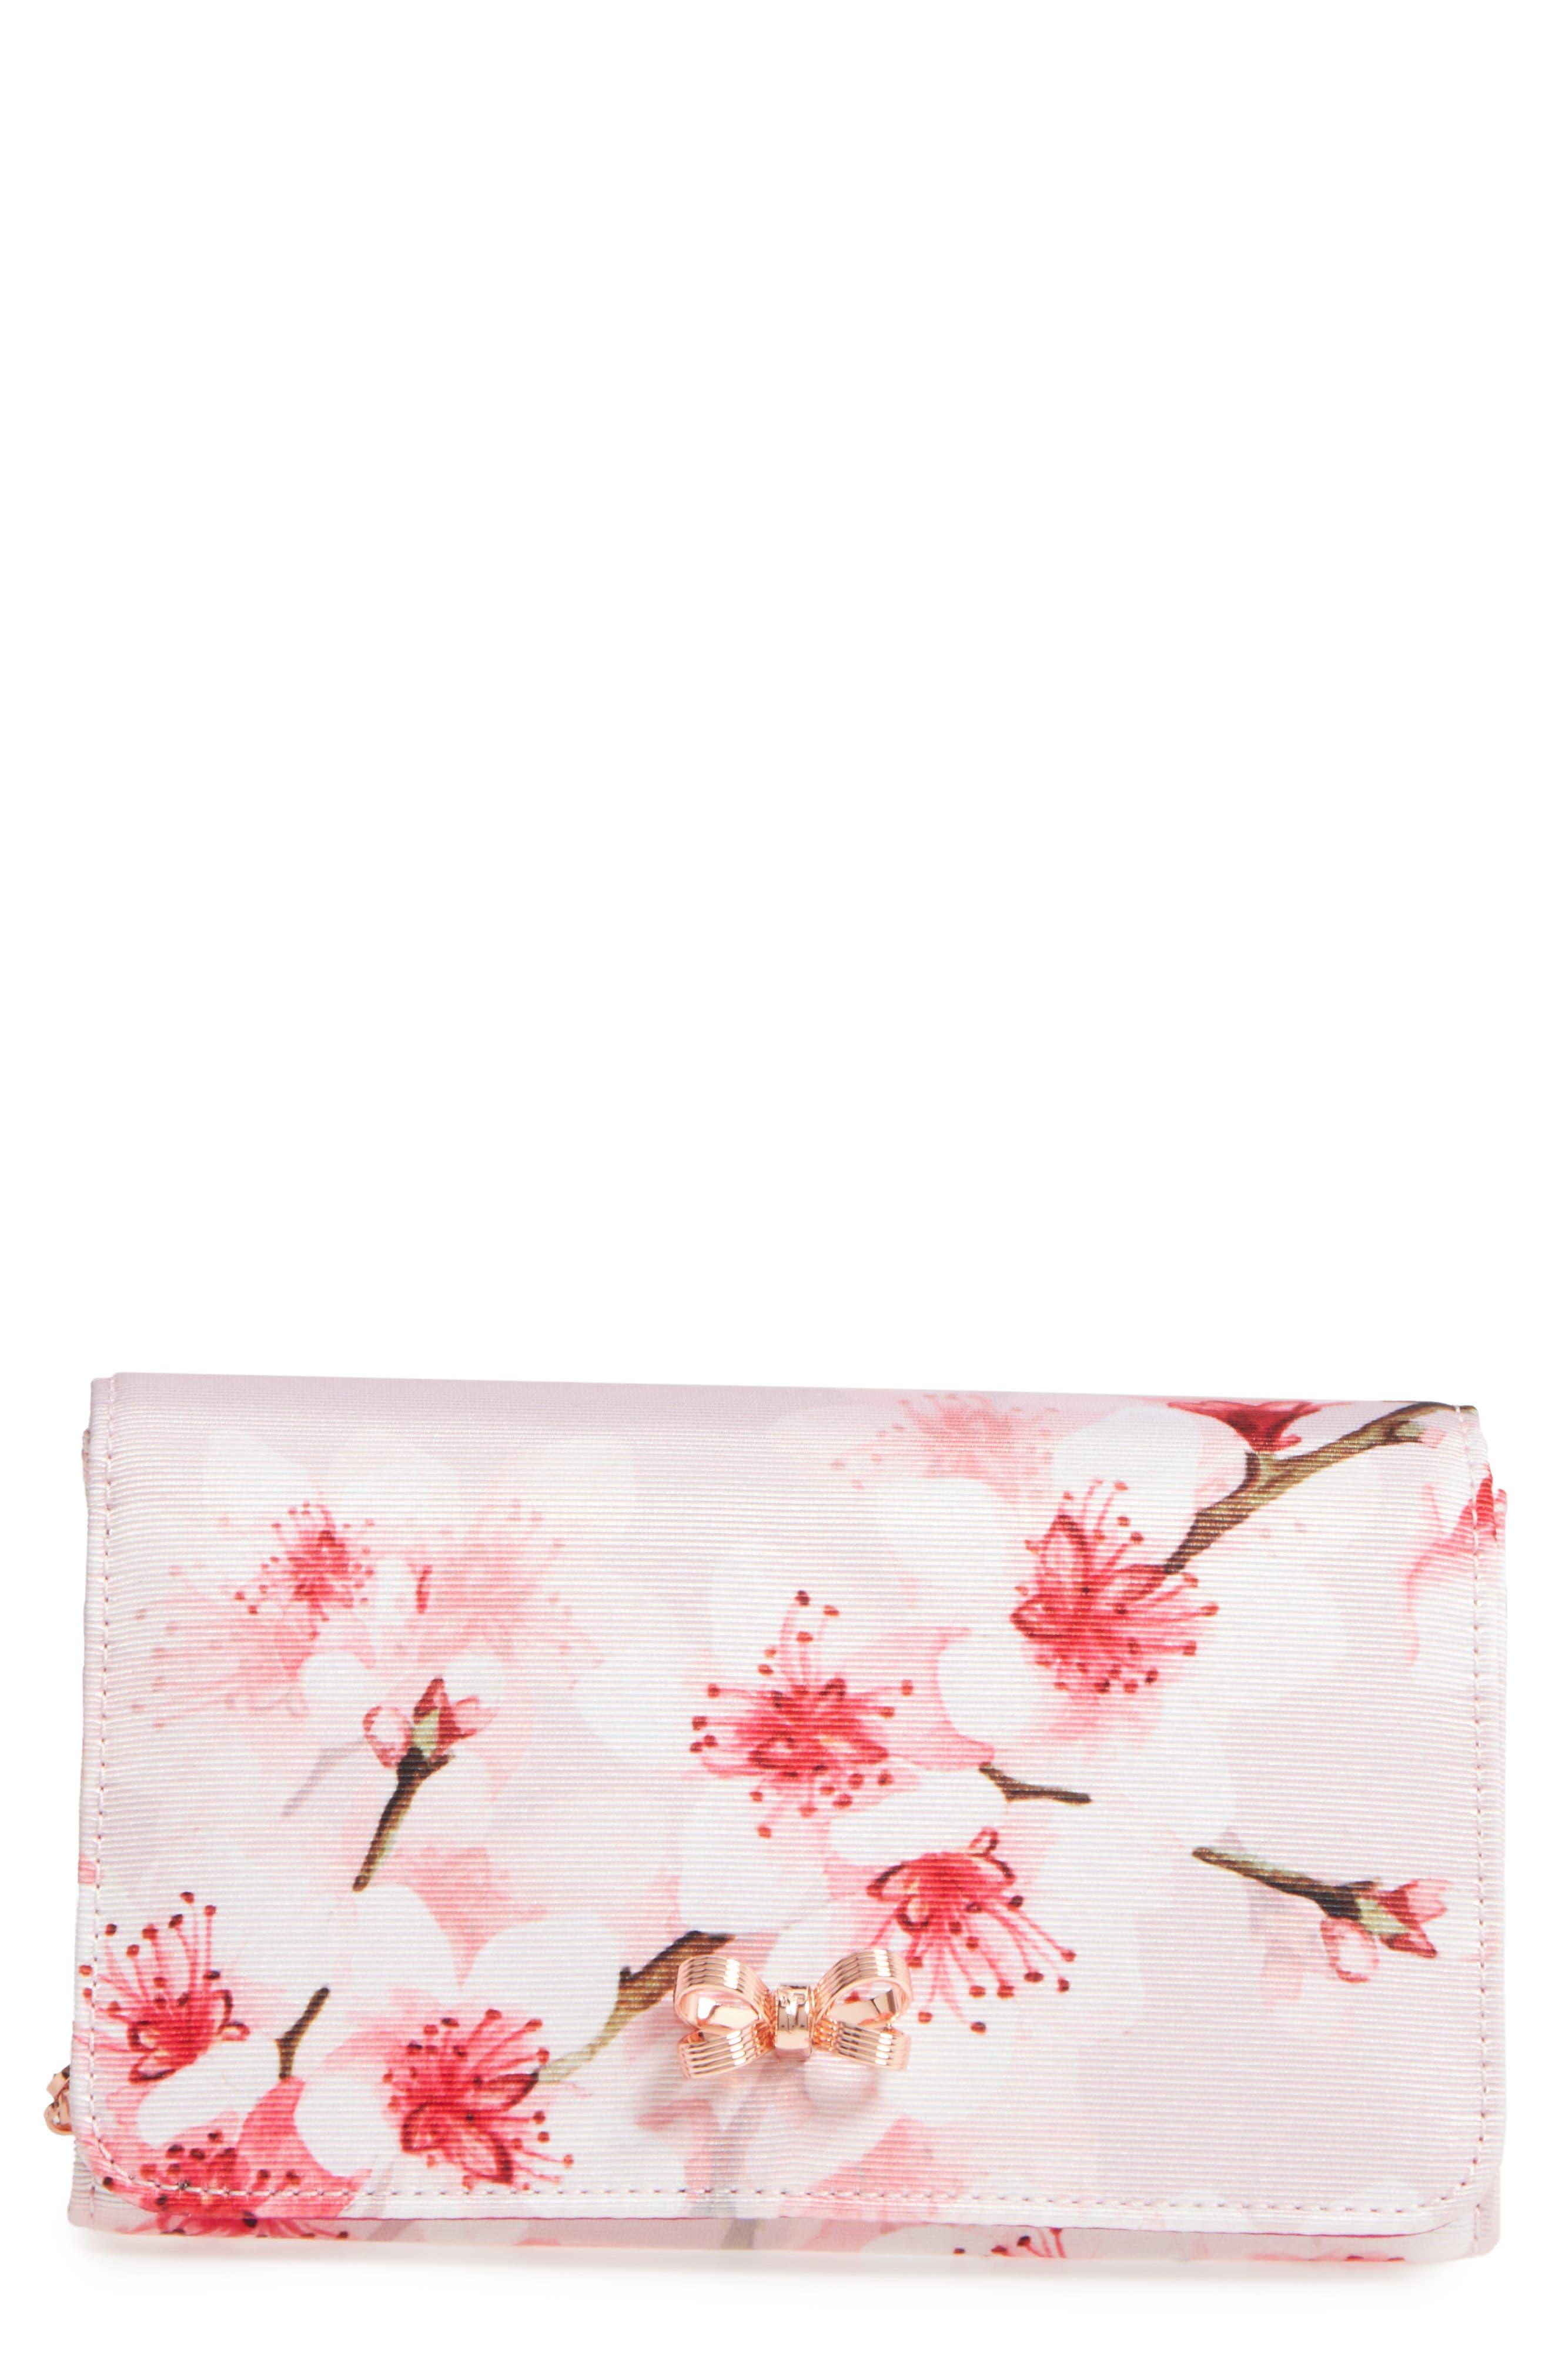 Main Image - Ted Baker London Basina Floral Print Clutch